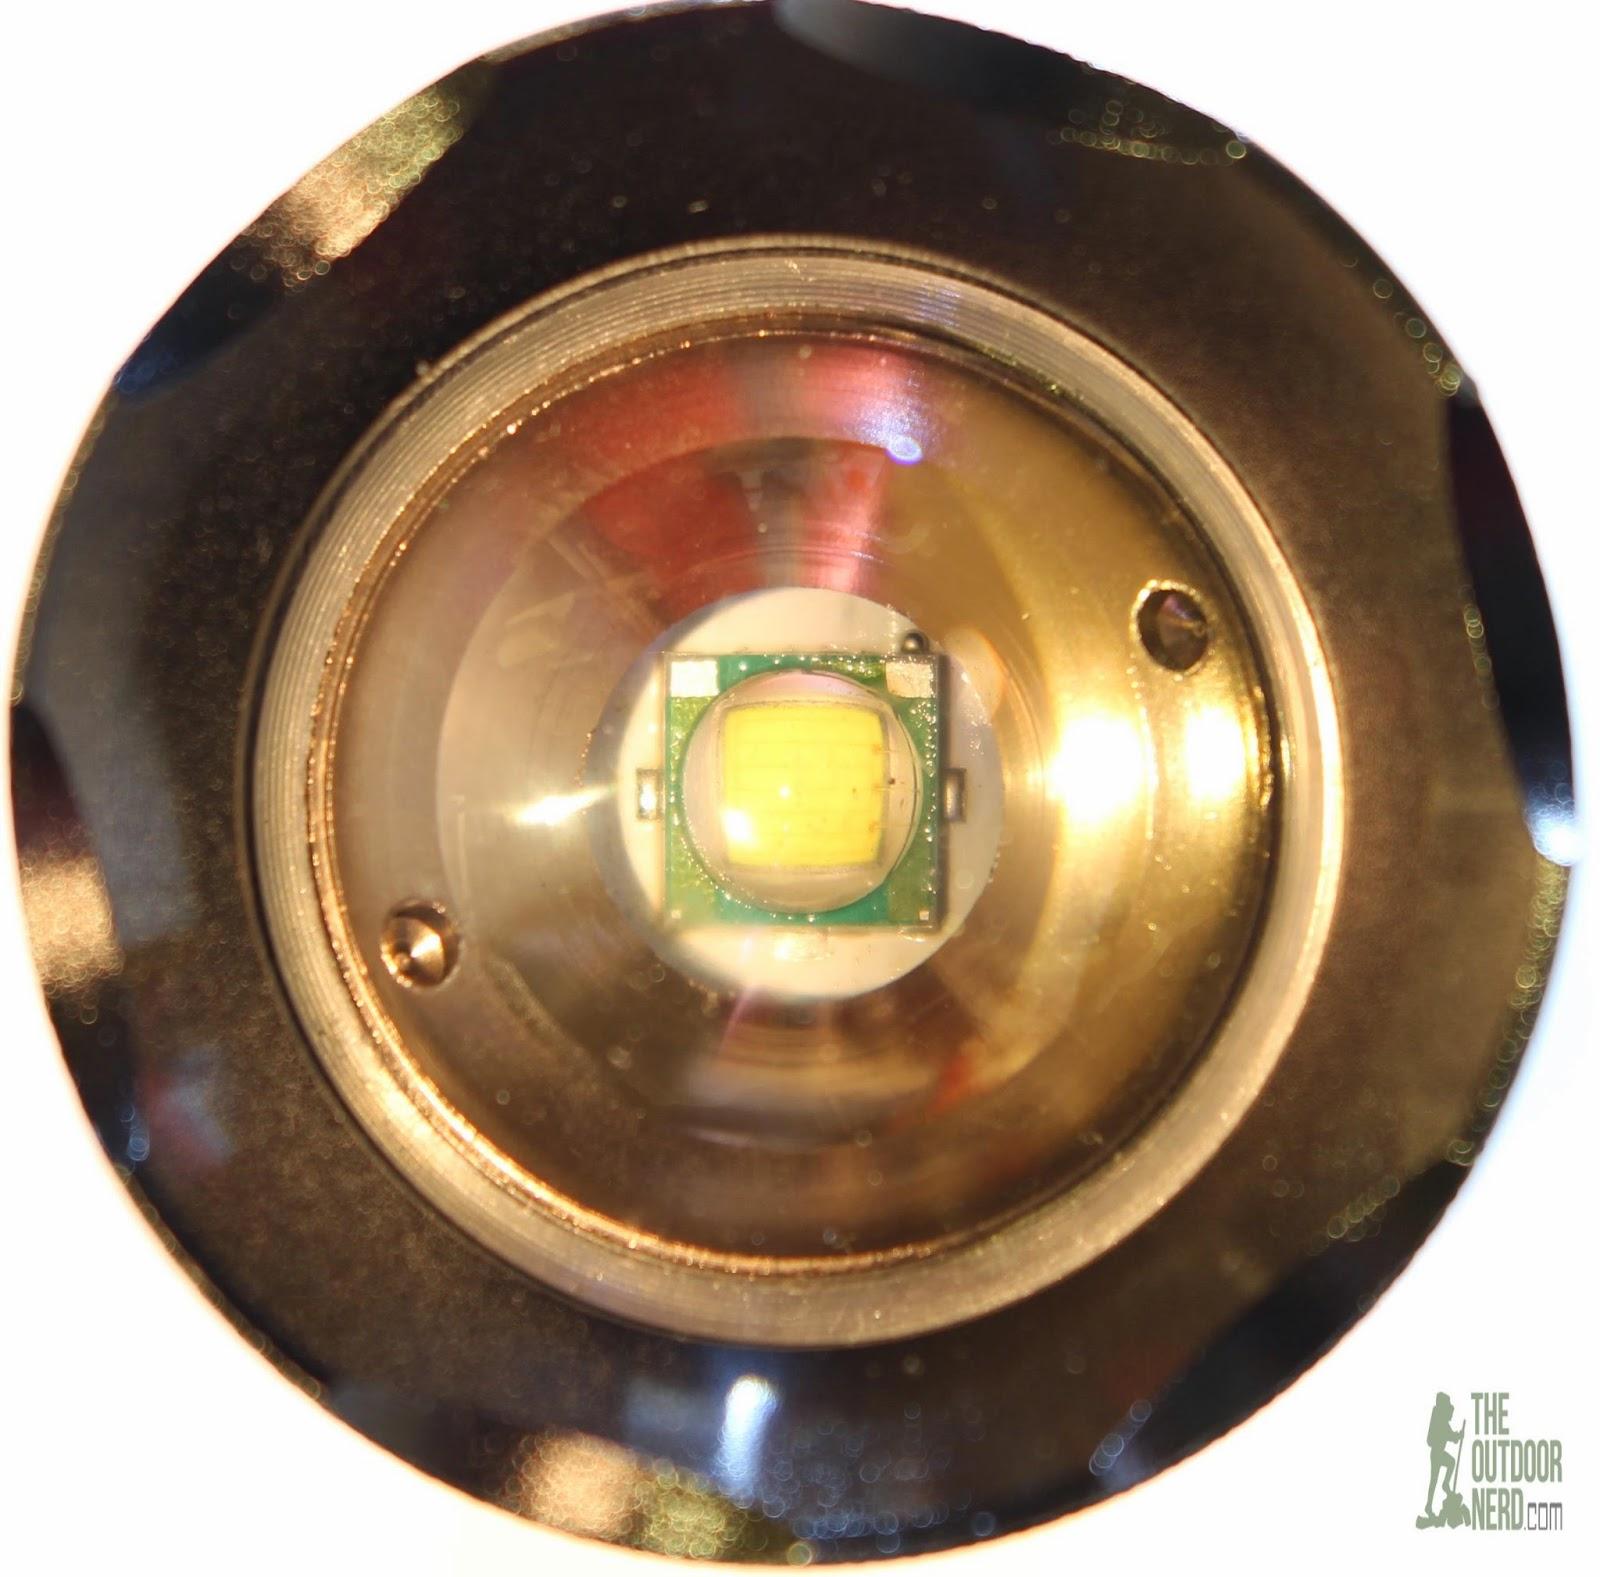 OxyLED MD50 Flashlight Kit - Cree XM-L LED Emitter Closeup